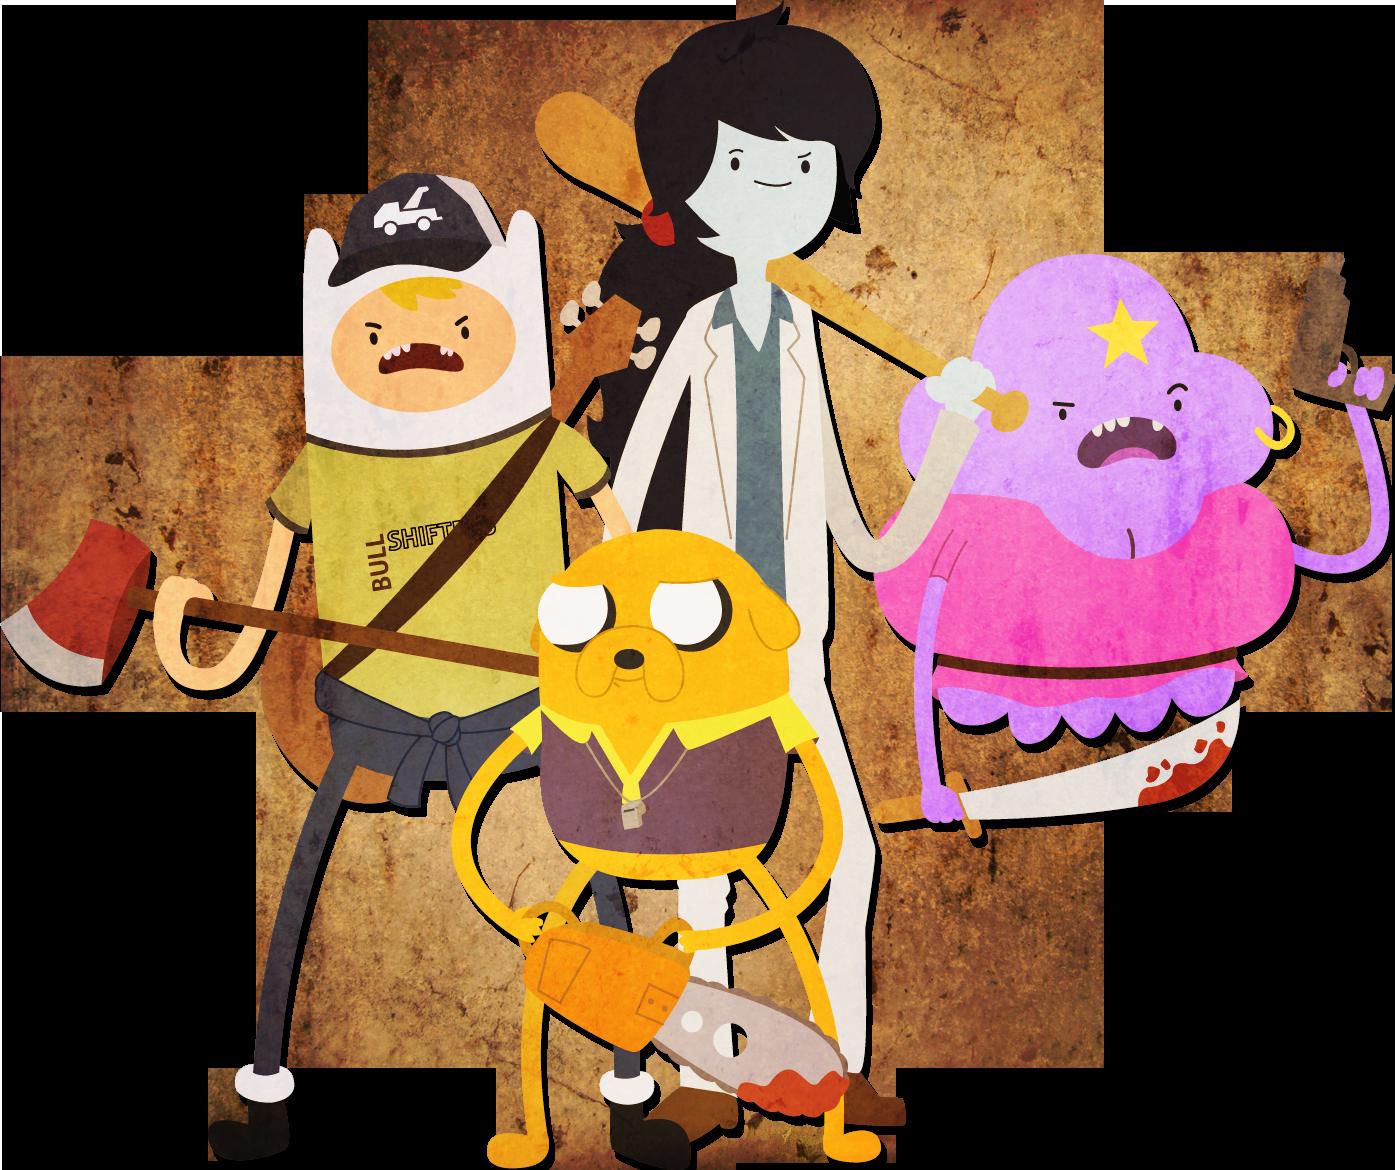 Adventure time meets Left 4 Dead by Sindorman